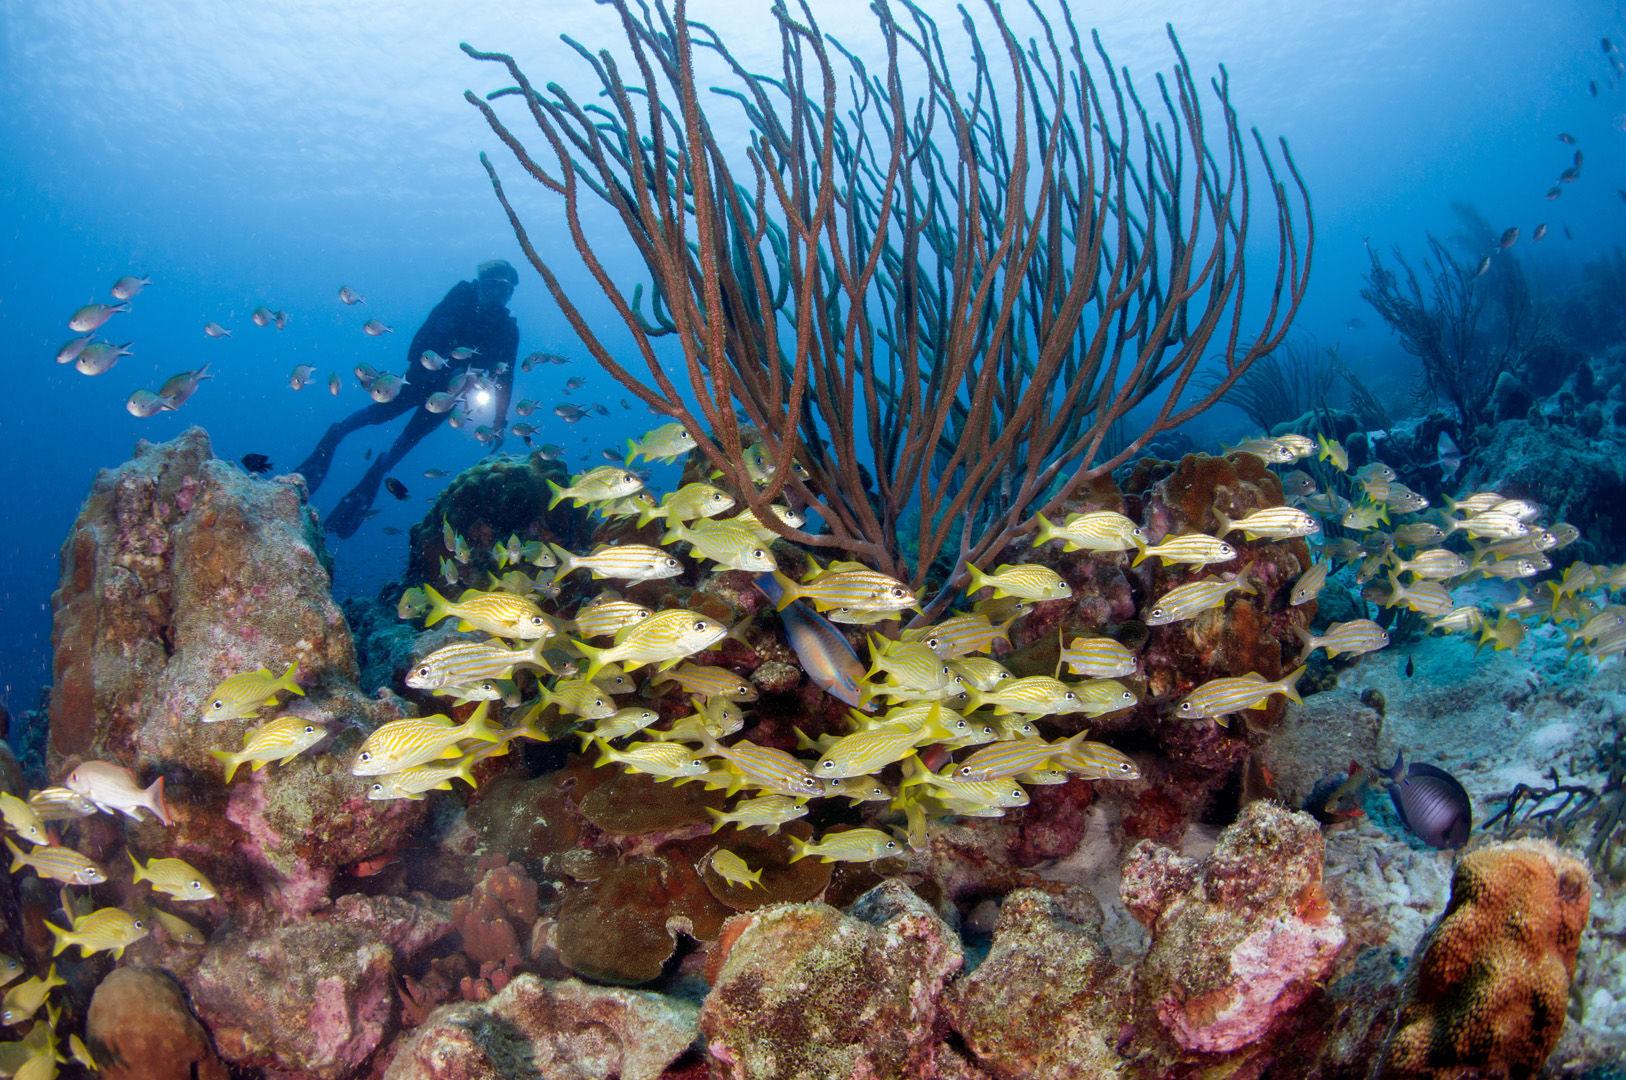 Diver exploring a reef full of life in Bonaire